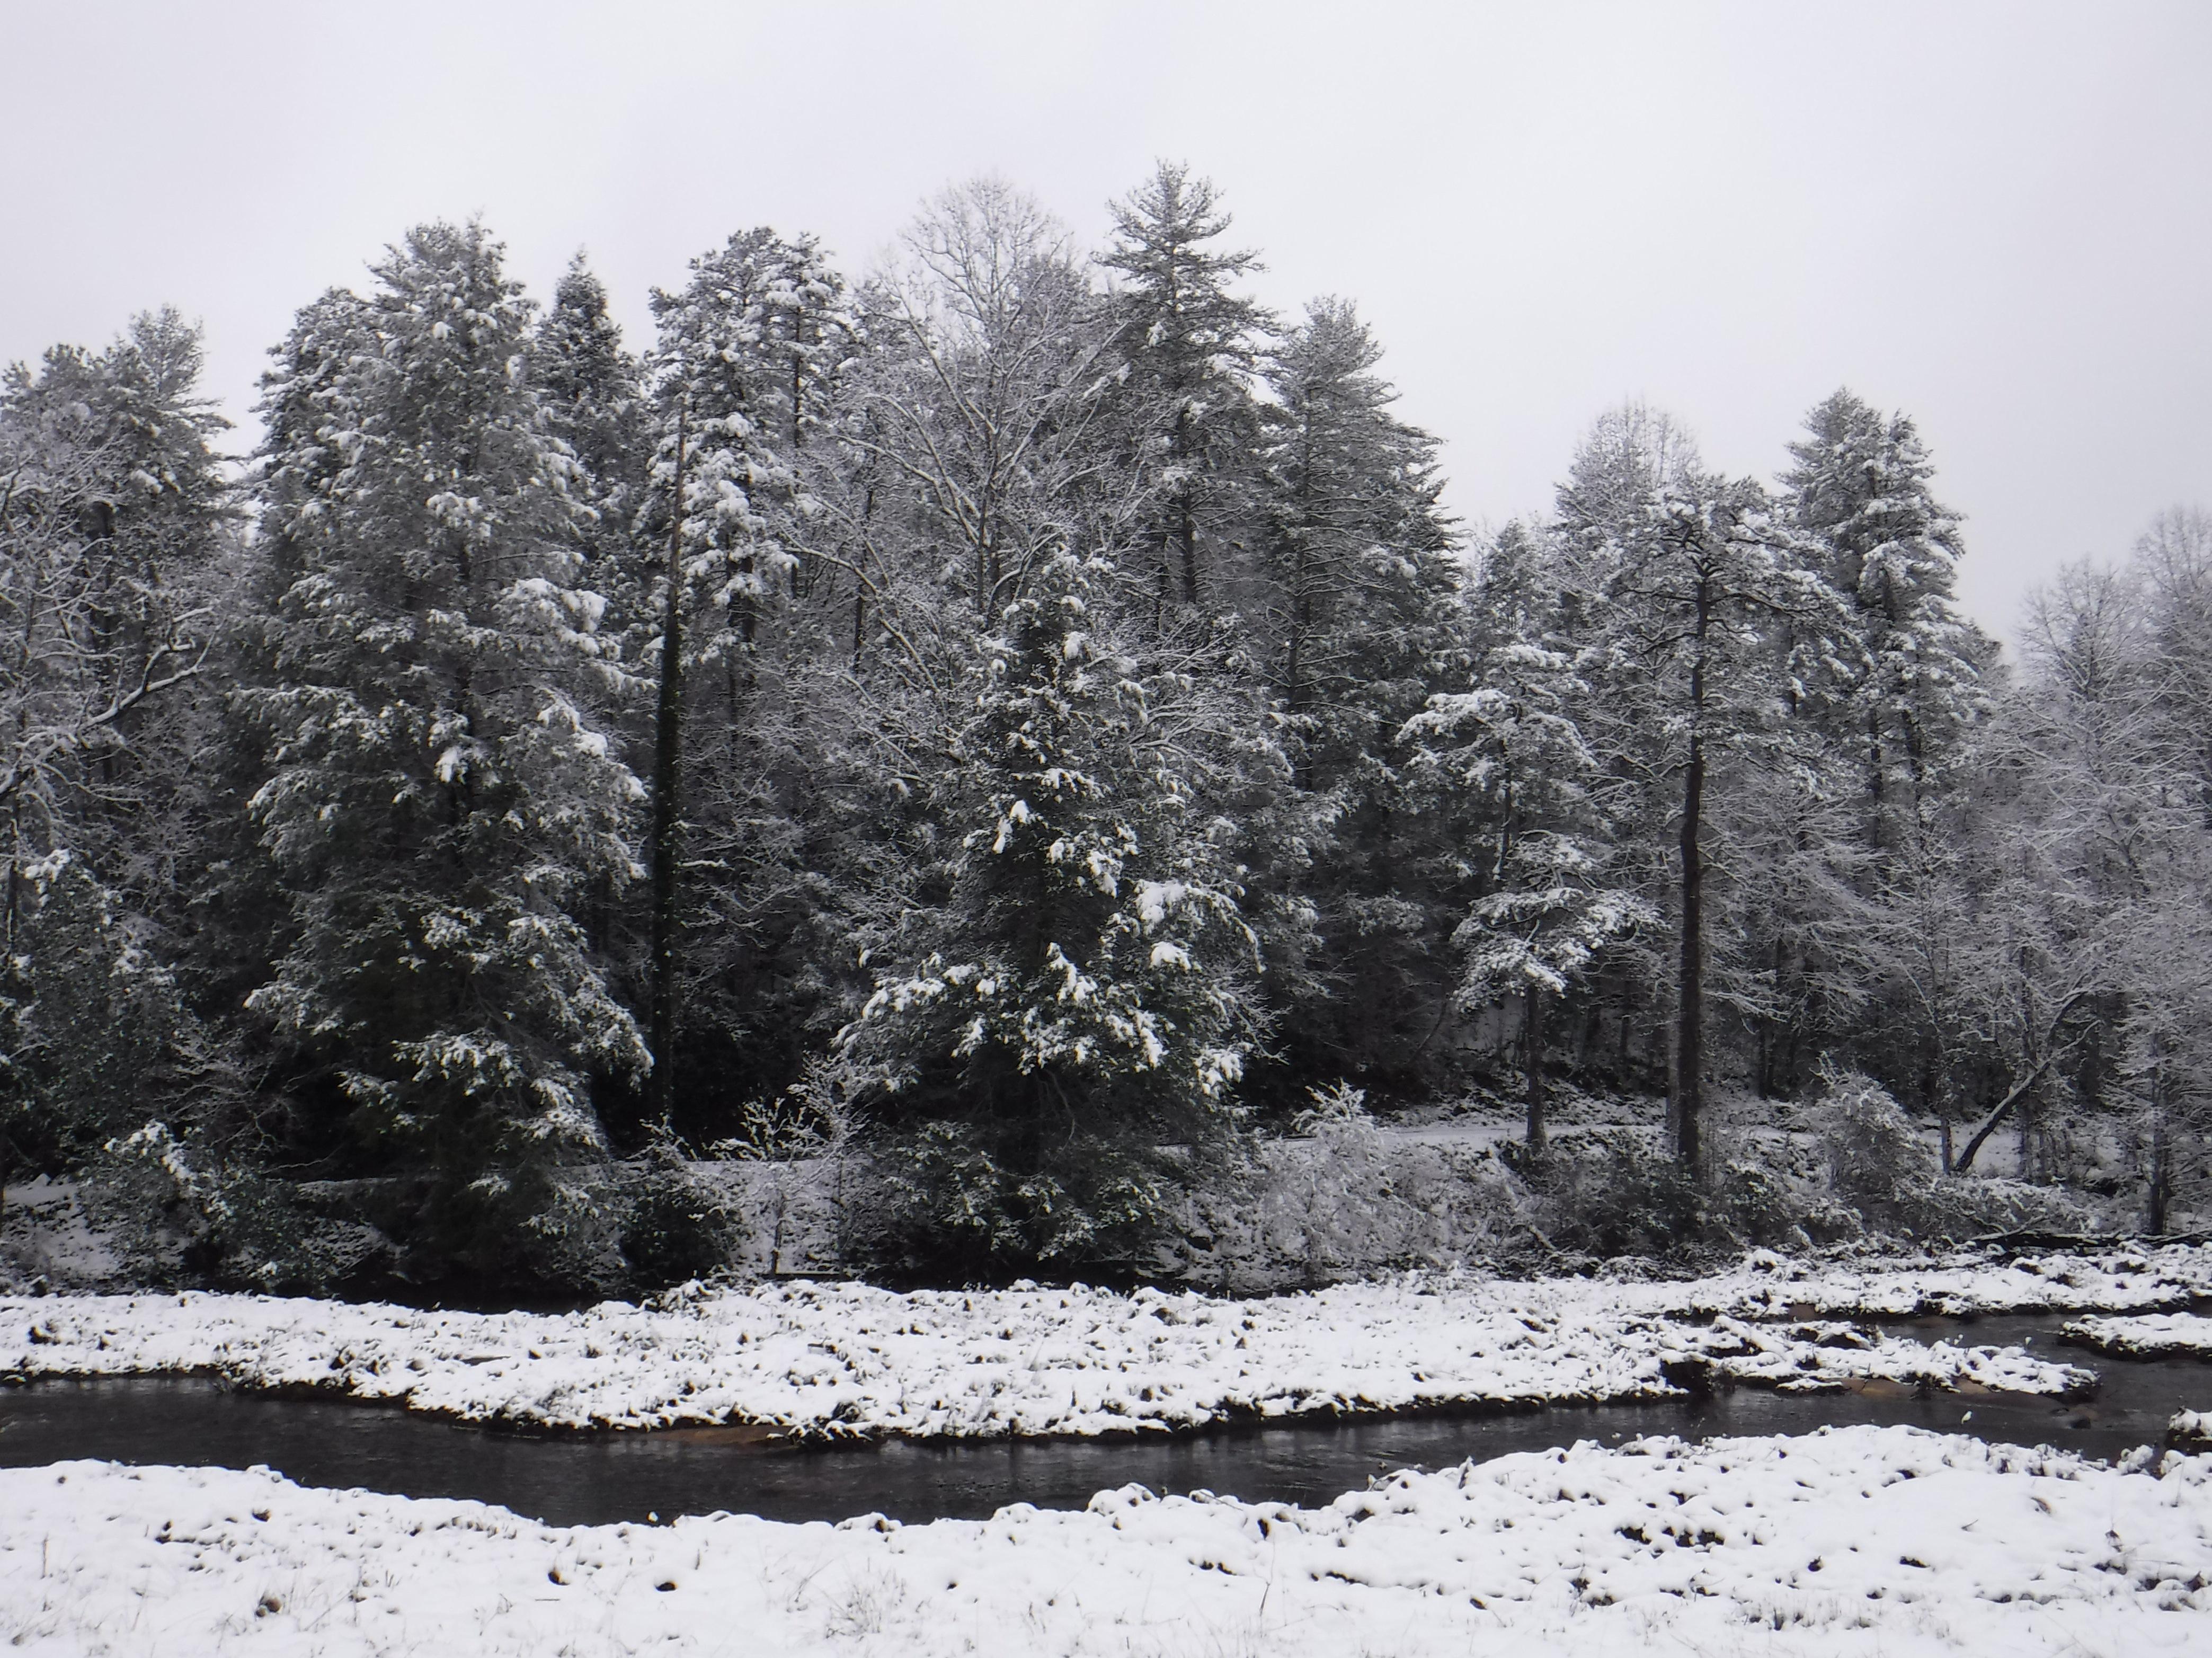 2020-02-08 Snow-10 TreeRv